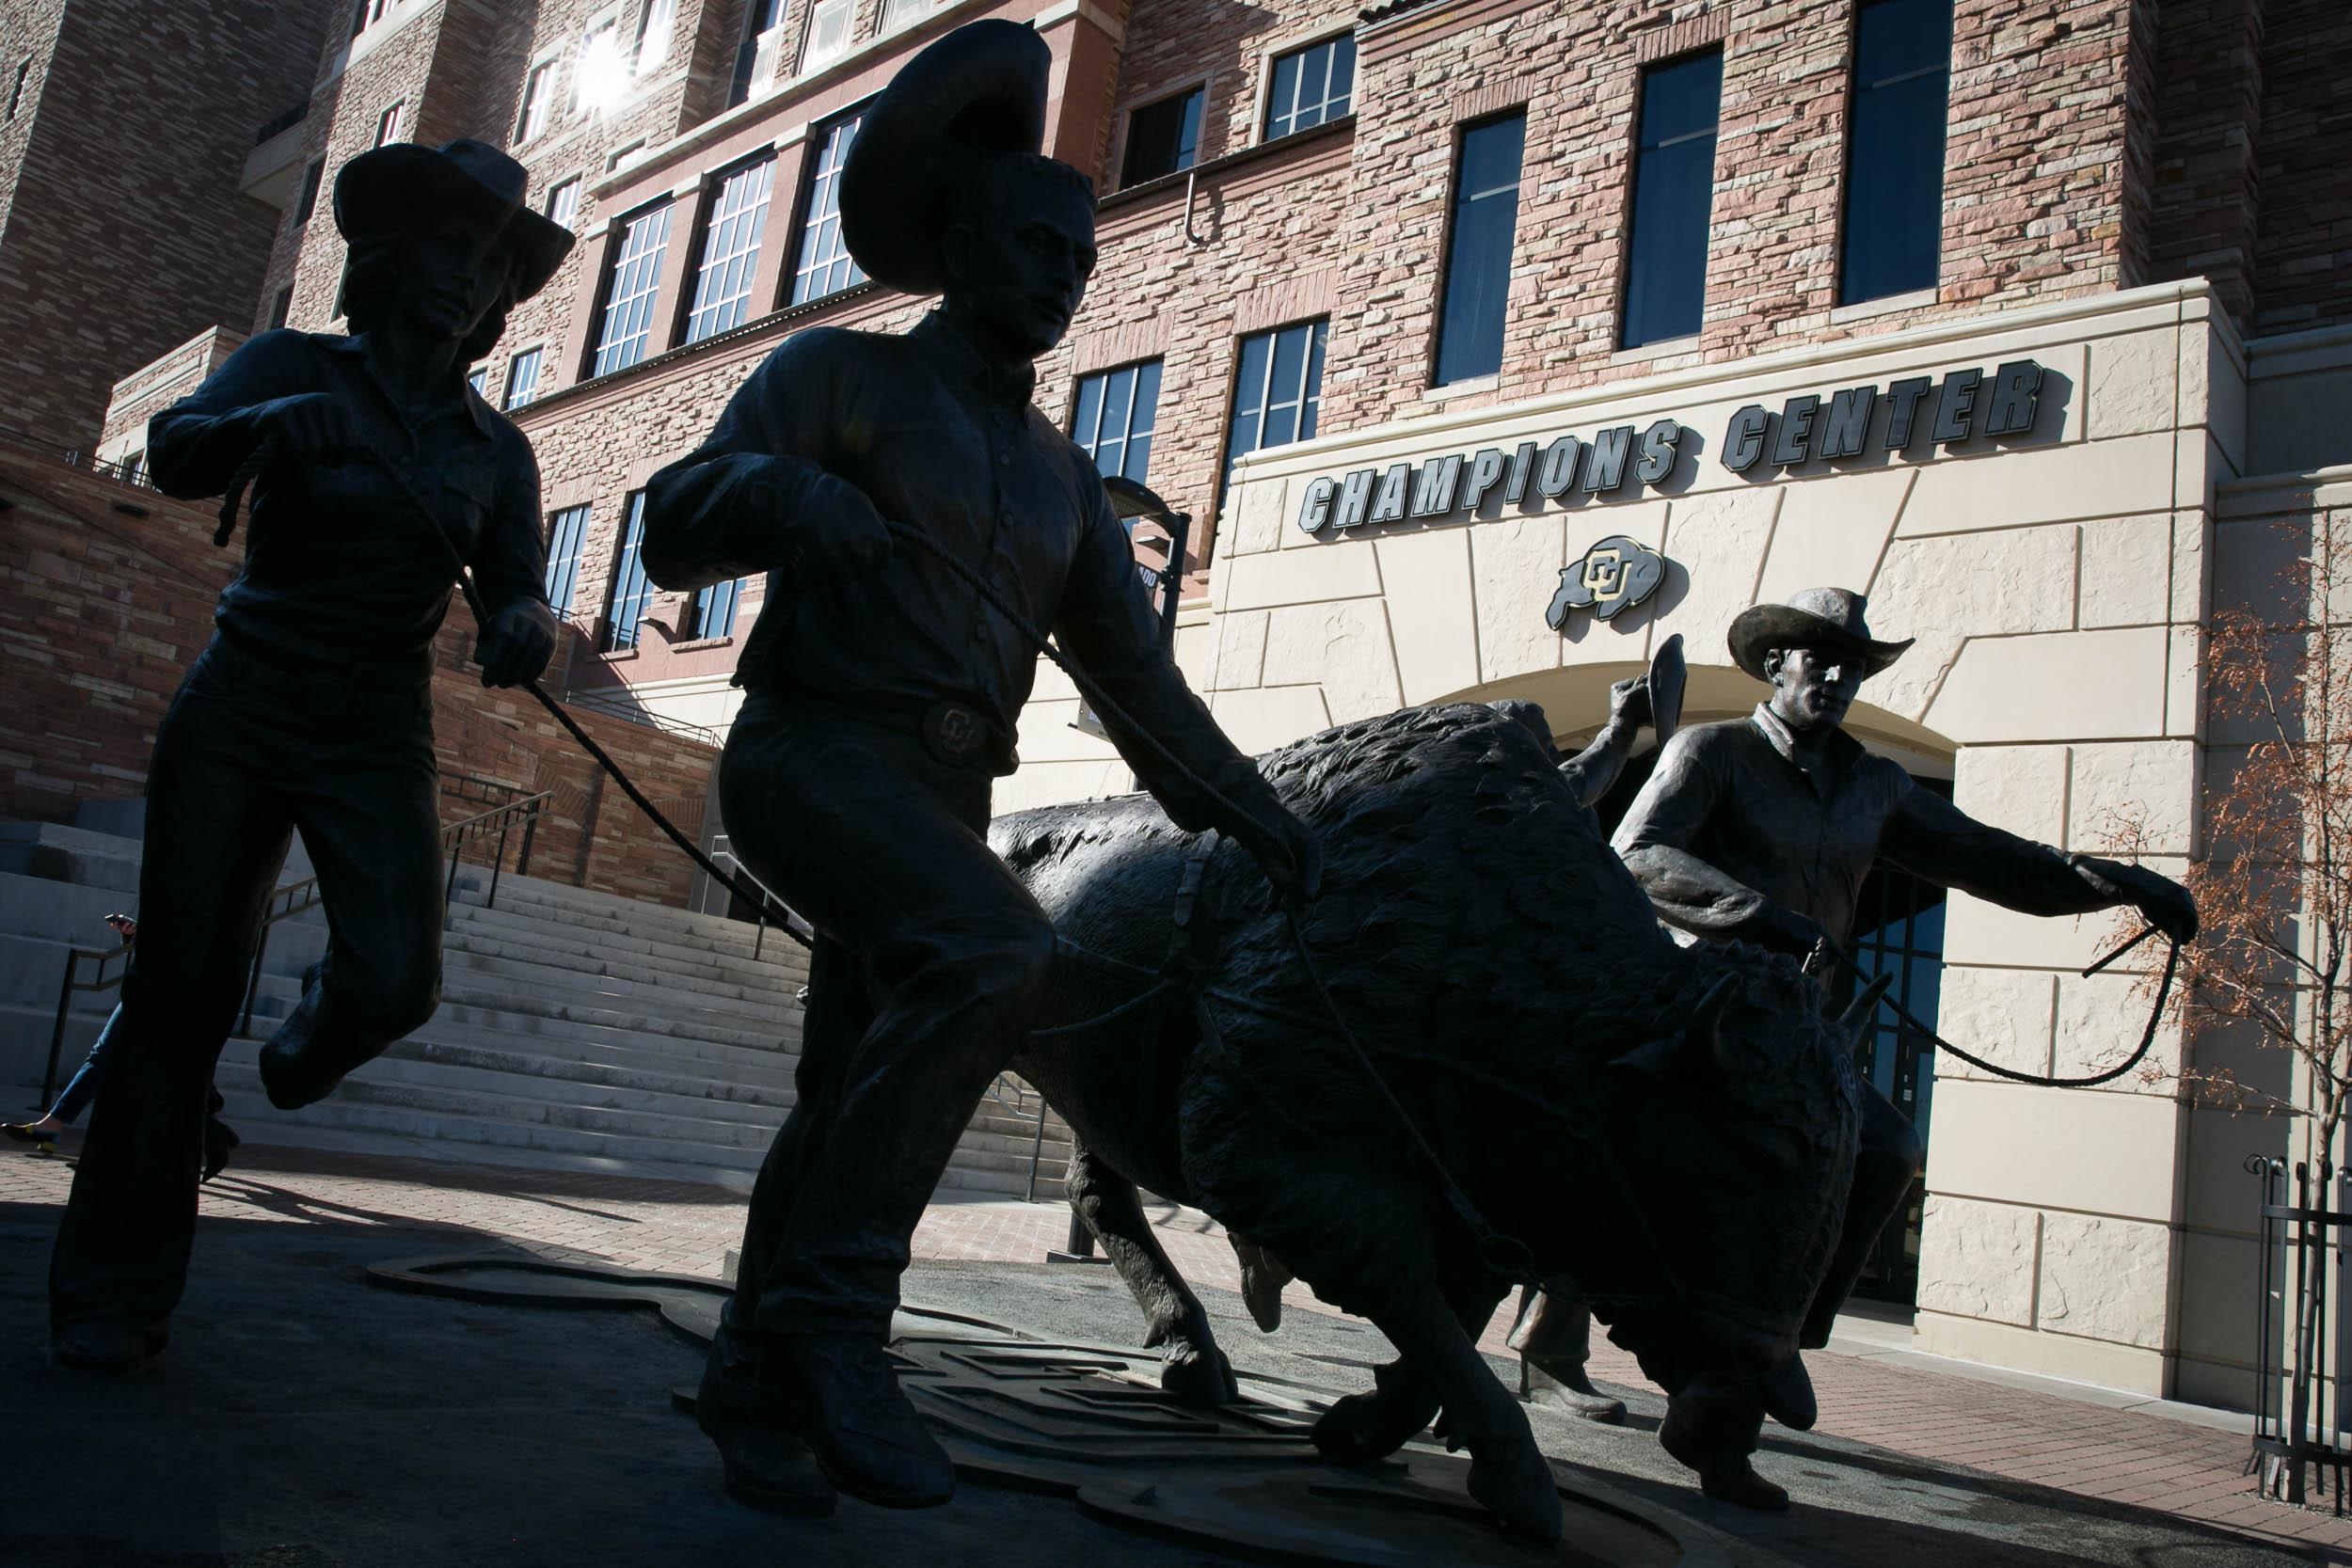 Statue commemorating CU Boulder Mascot Ralphie